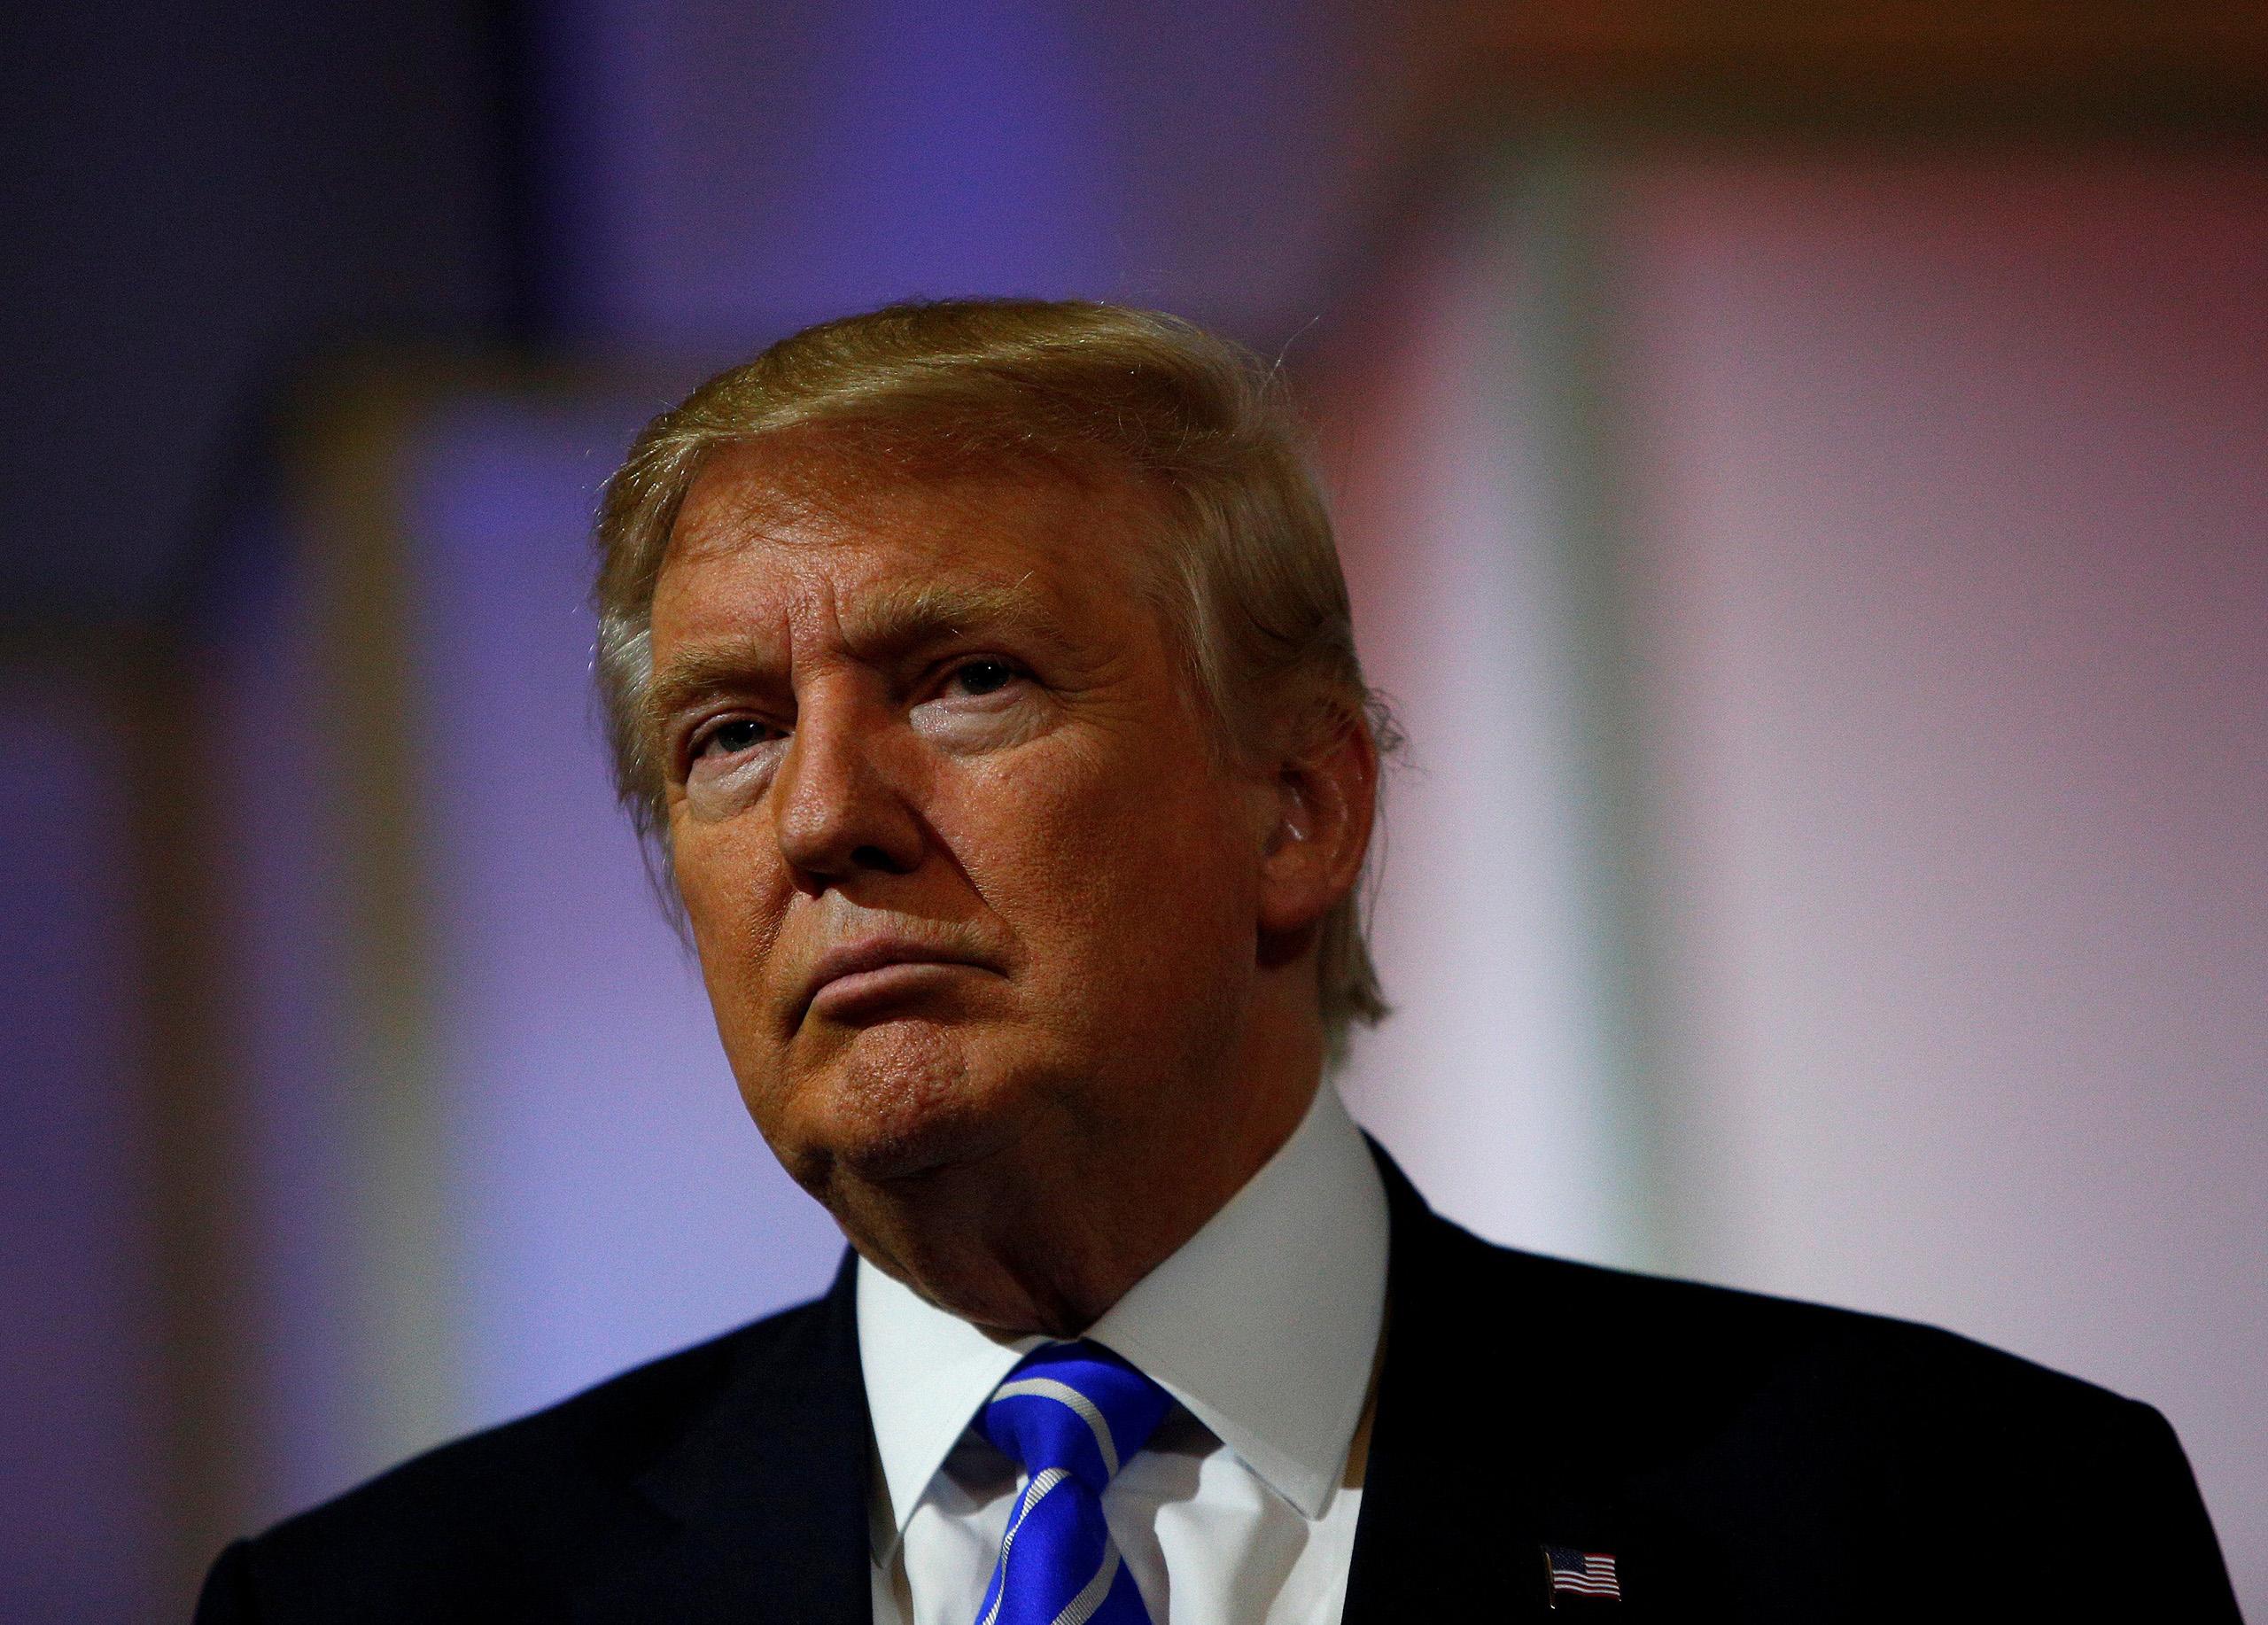 Donald Trump attends a campaign rally in Abingdon, Virginia, Aug. 10, 2016.